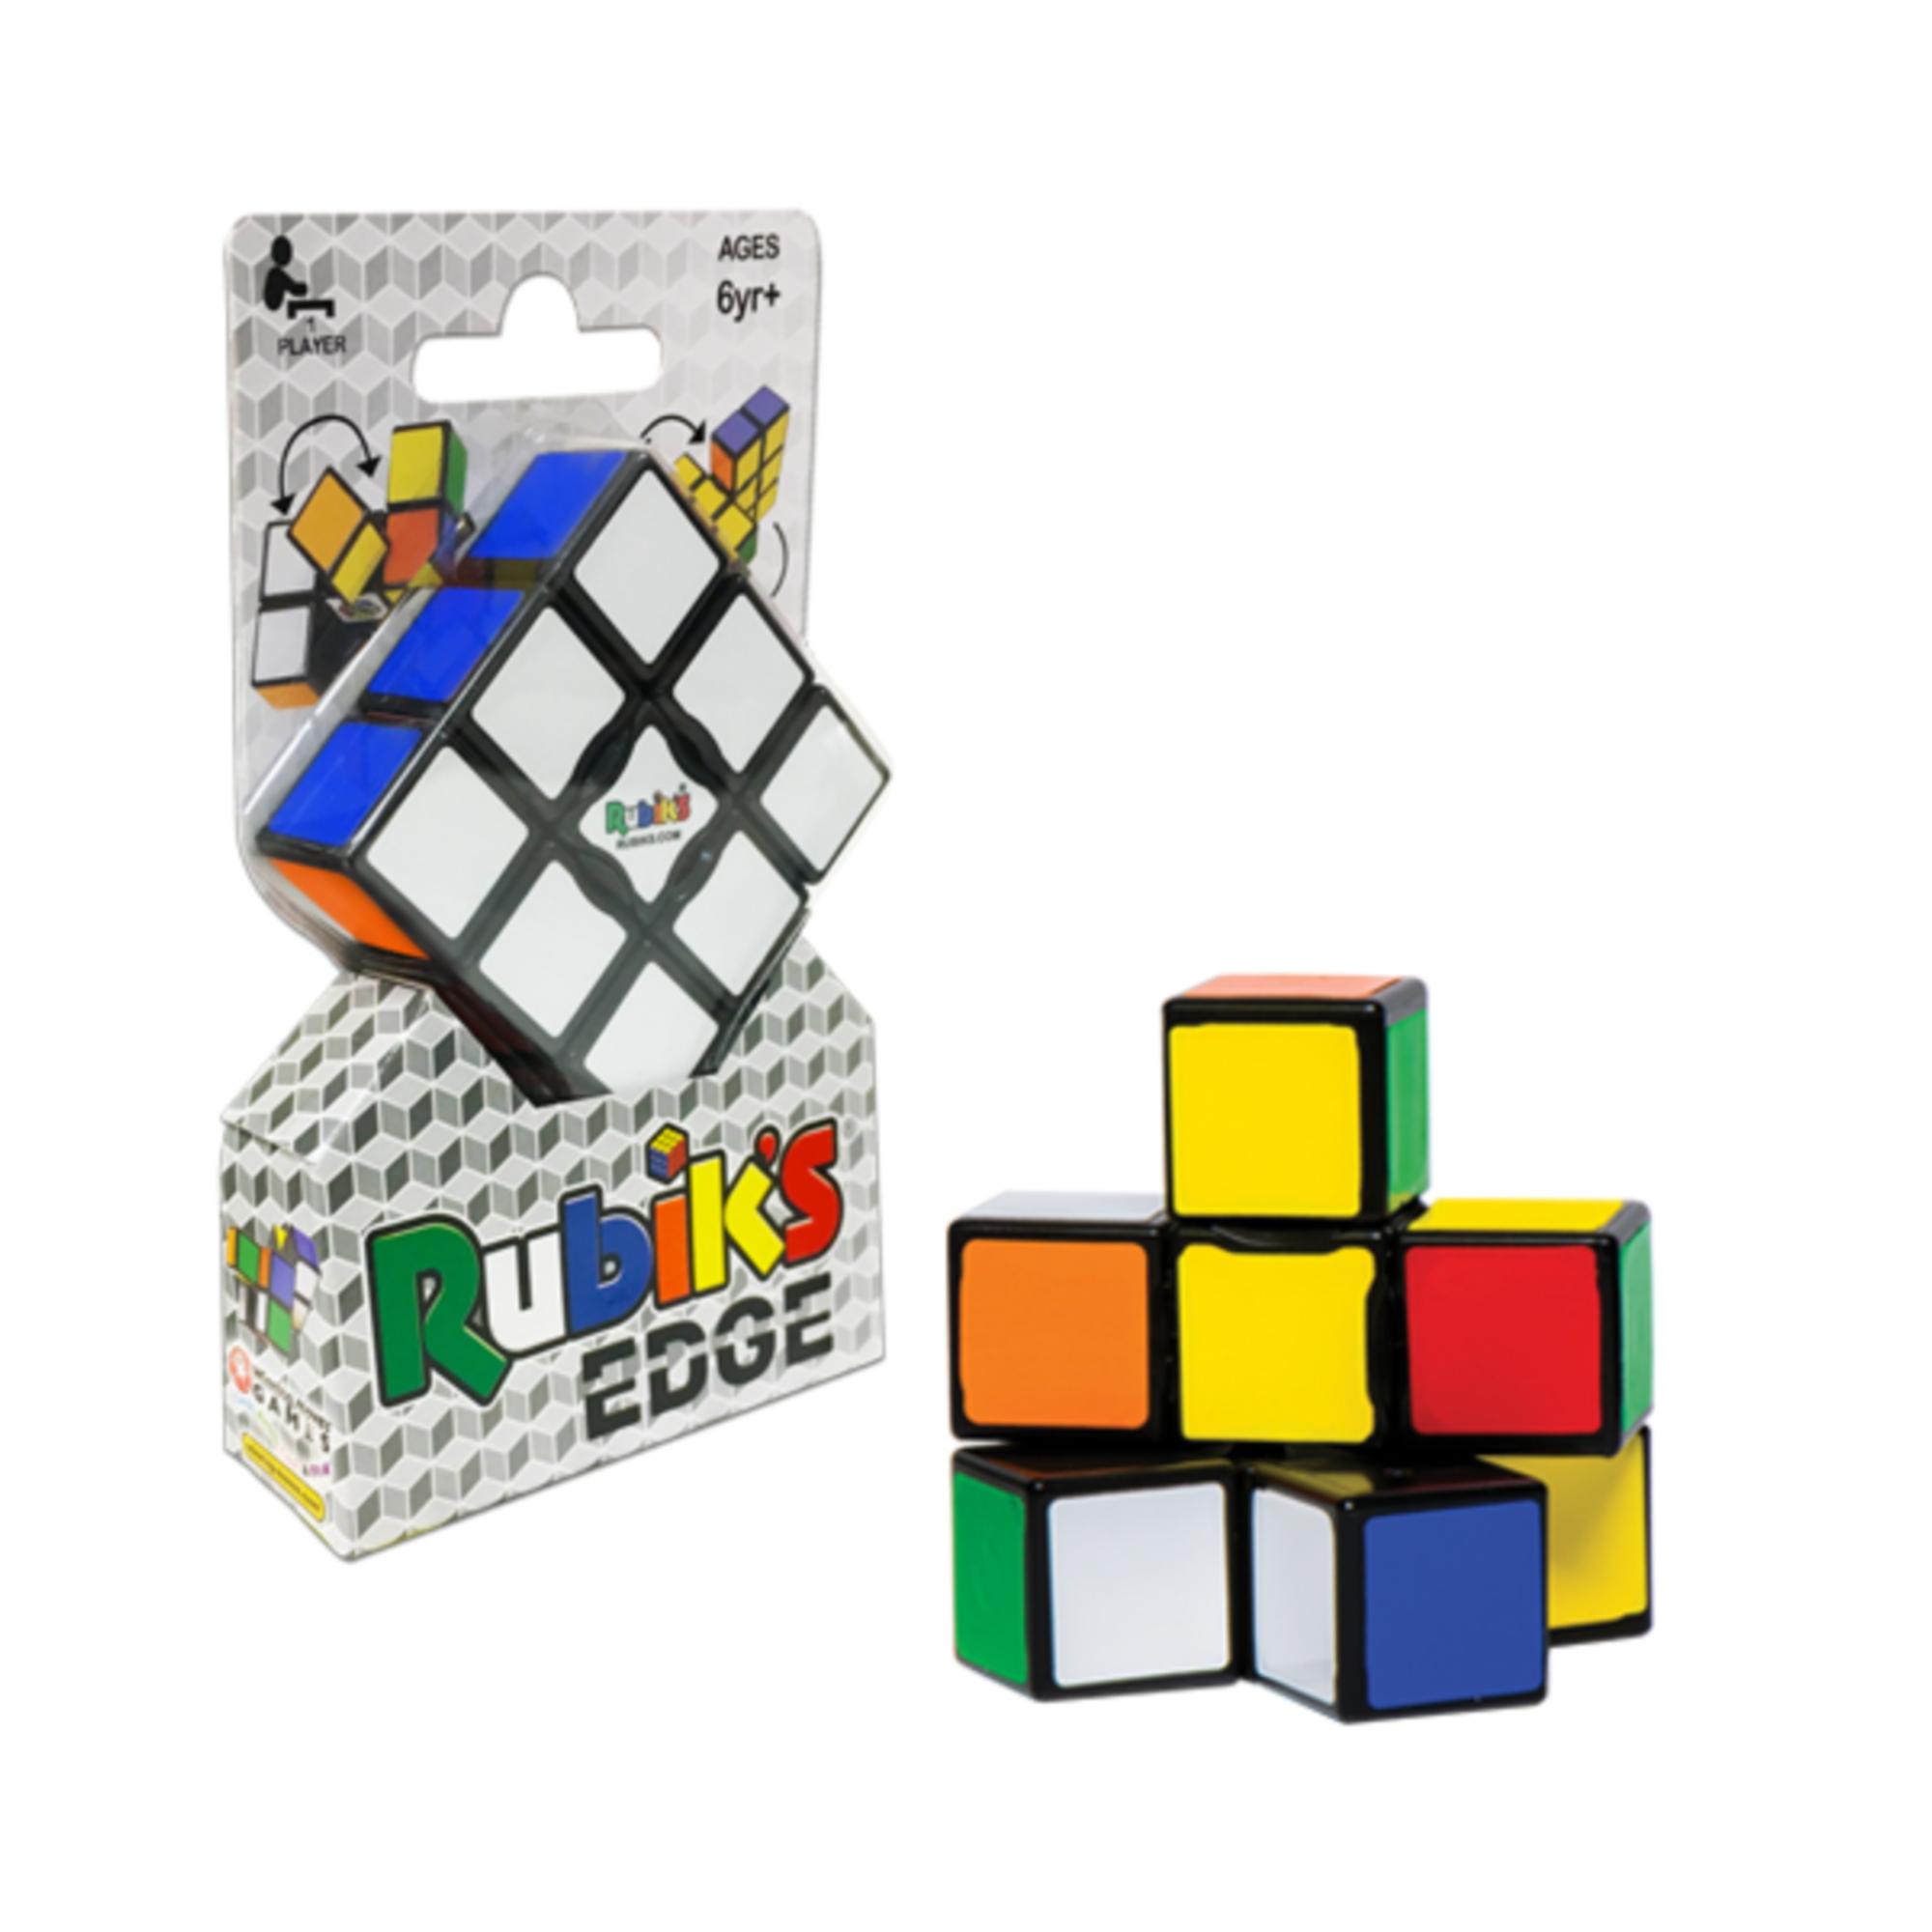 Rubik Rubik's Edge